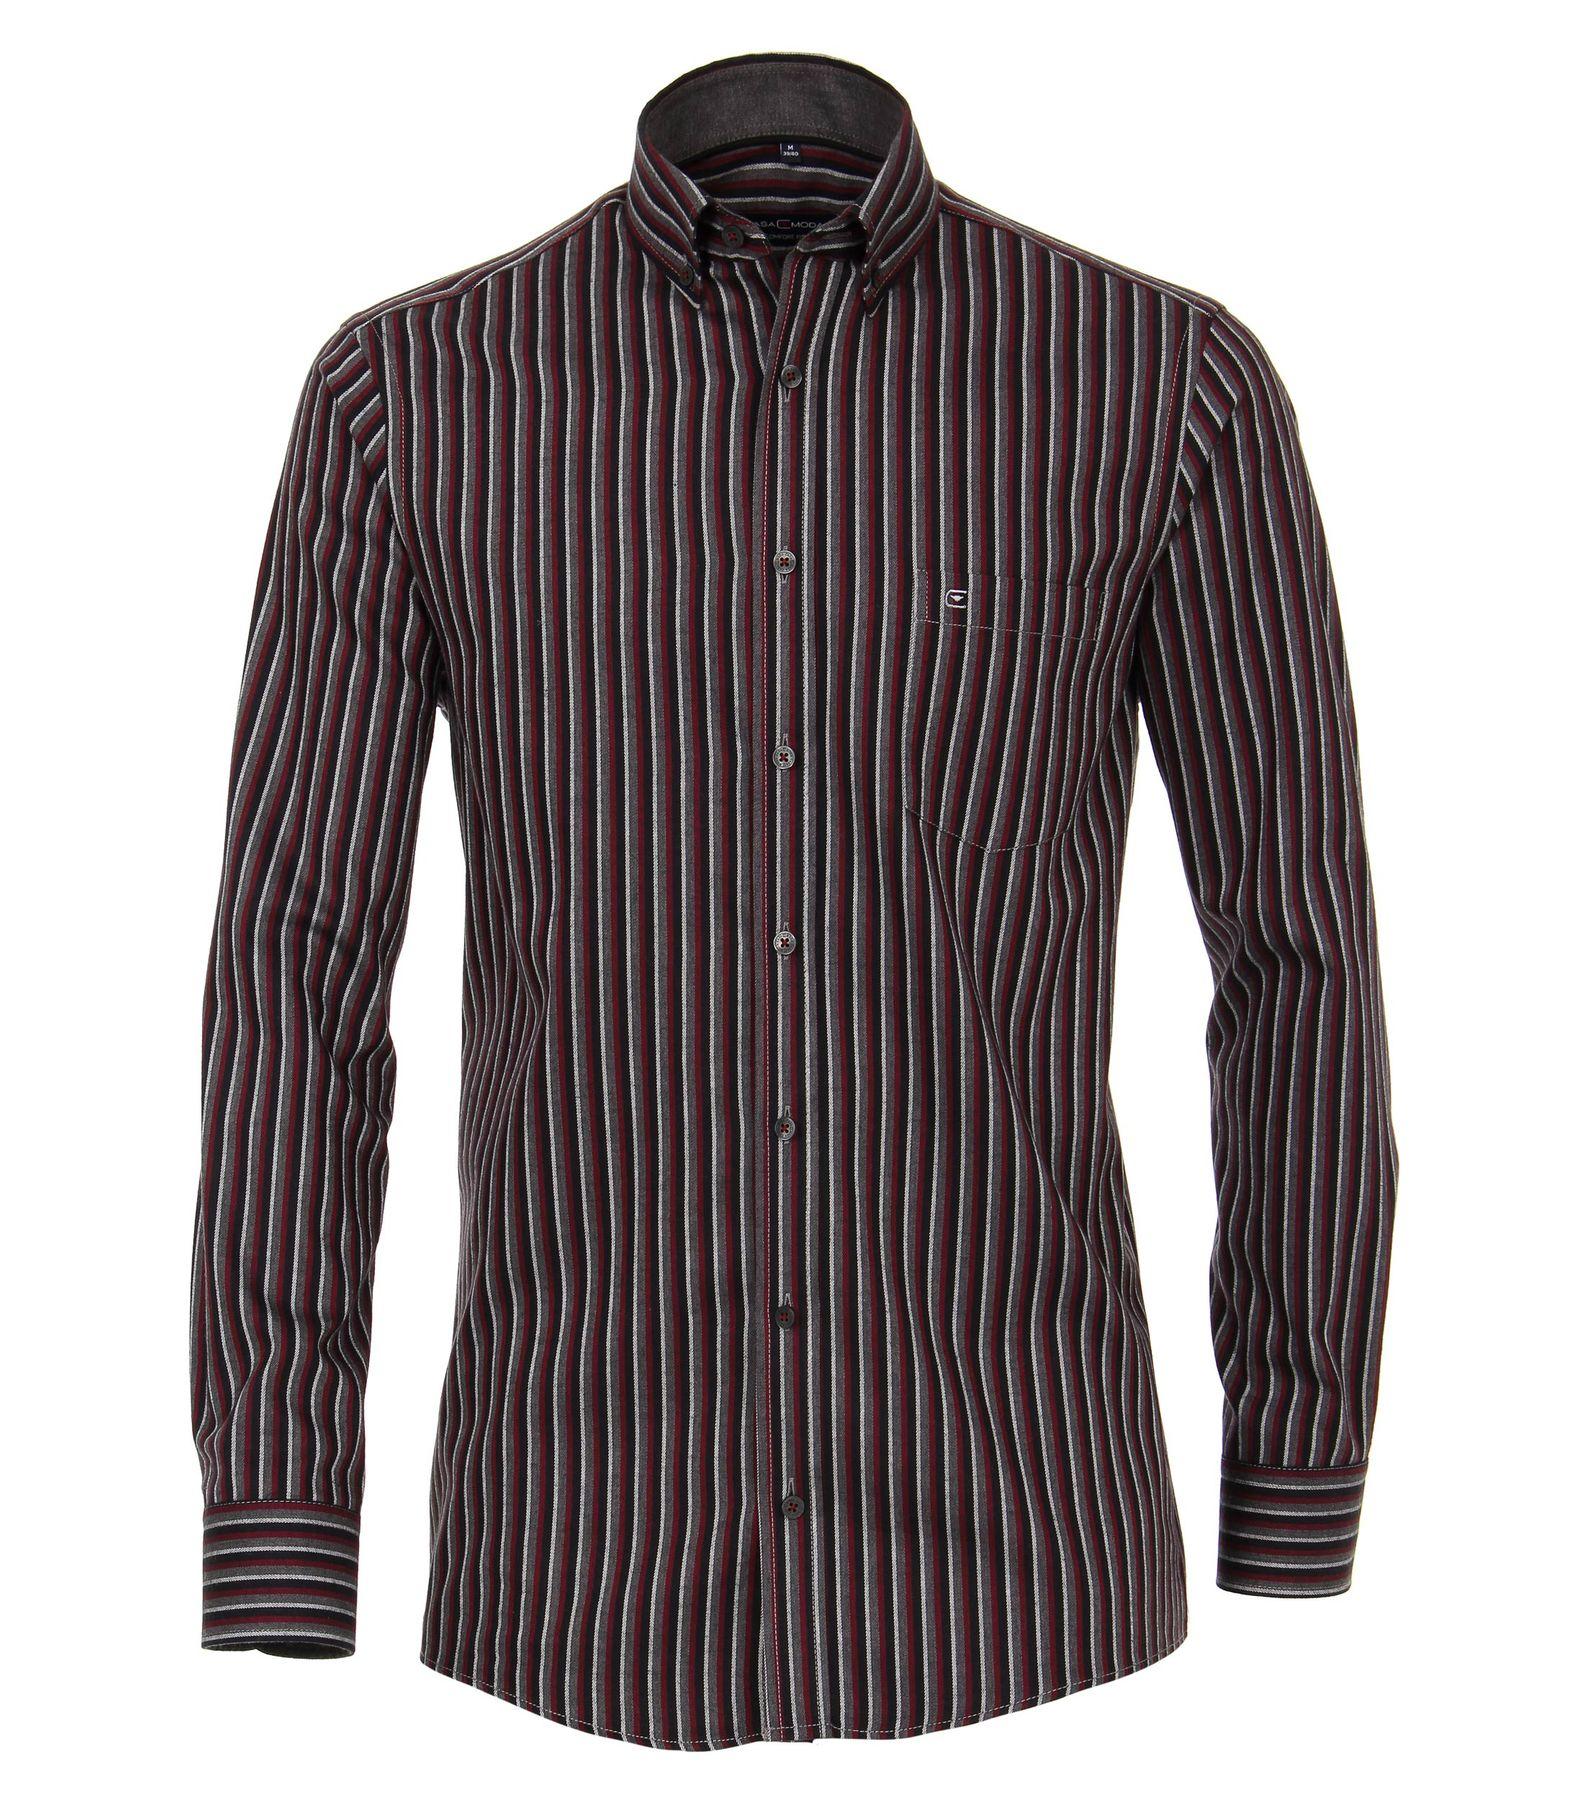 Casa Moda - Comfort Fit - Gepeachtes Herren Langarm Hemd gestreift mit Button-Down-Kragen (483090800) – Bild 2